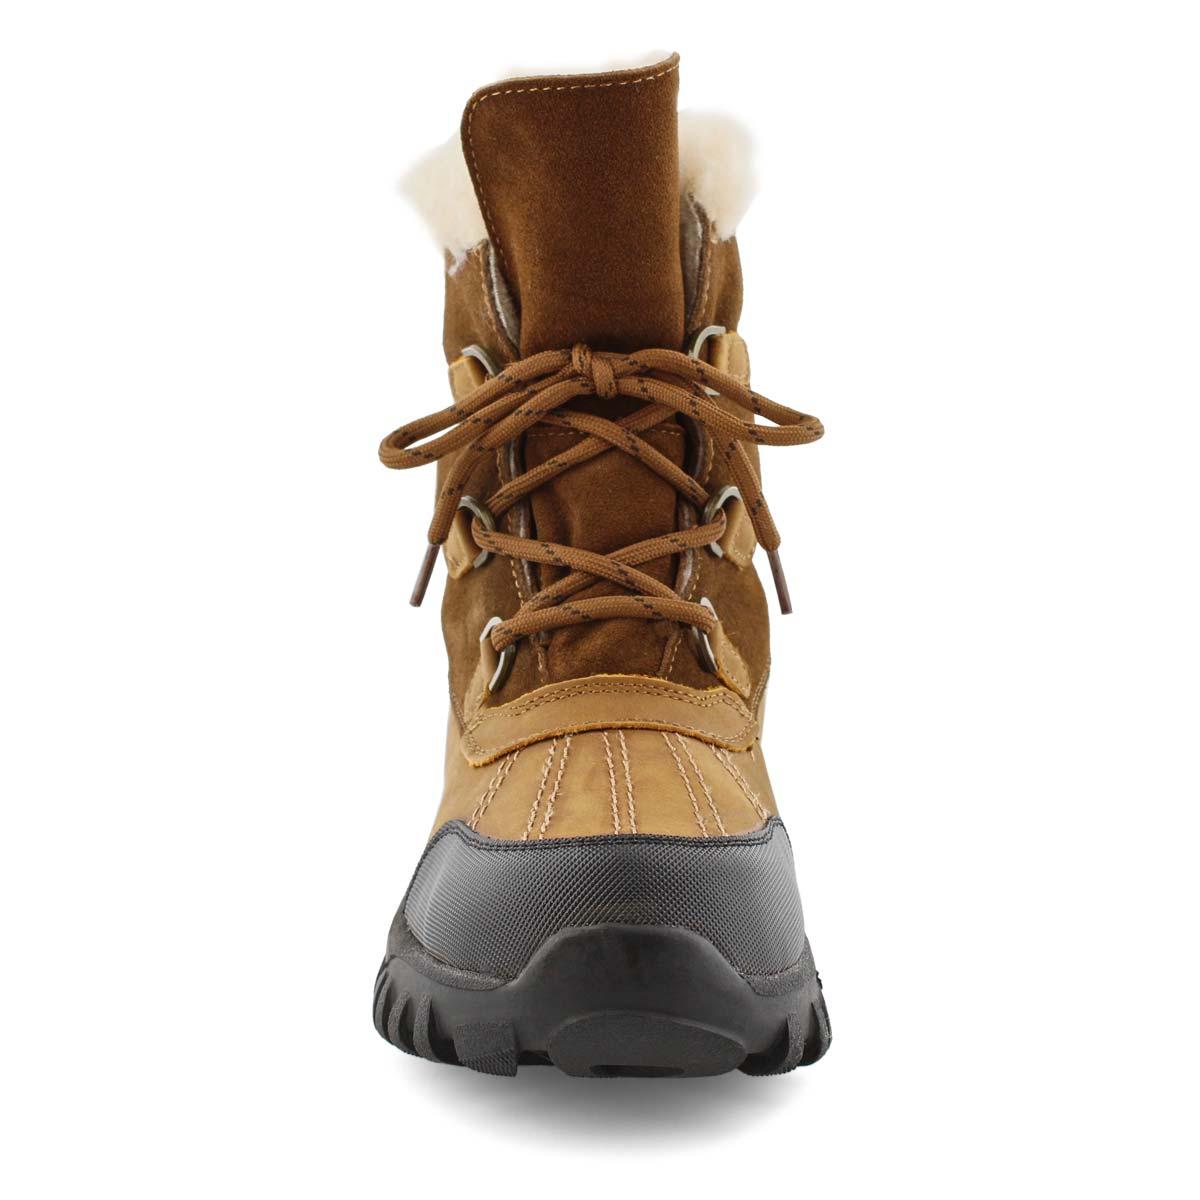 9749c214f Women | Winter Boots | SoftMoc.com bard